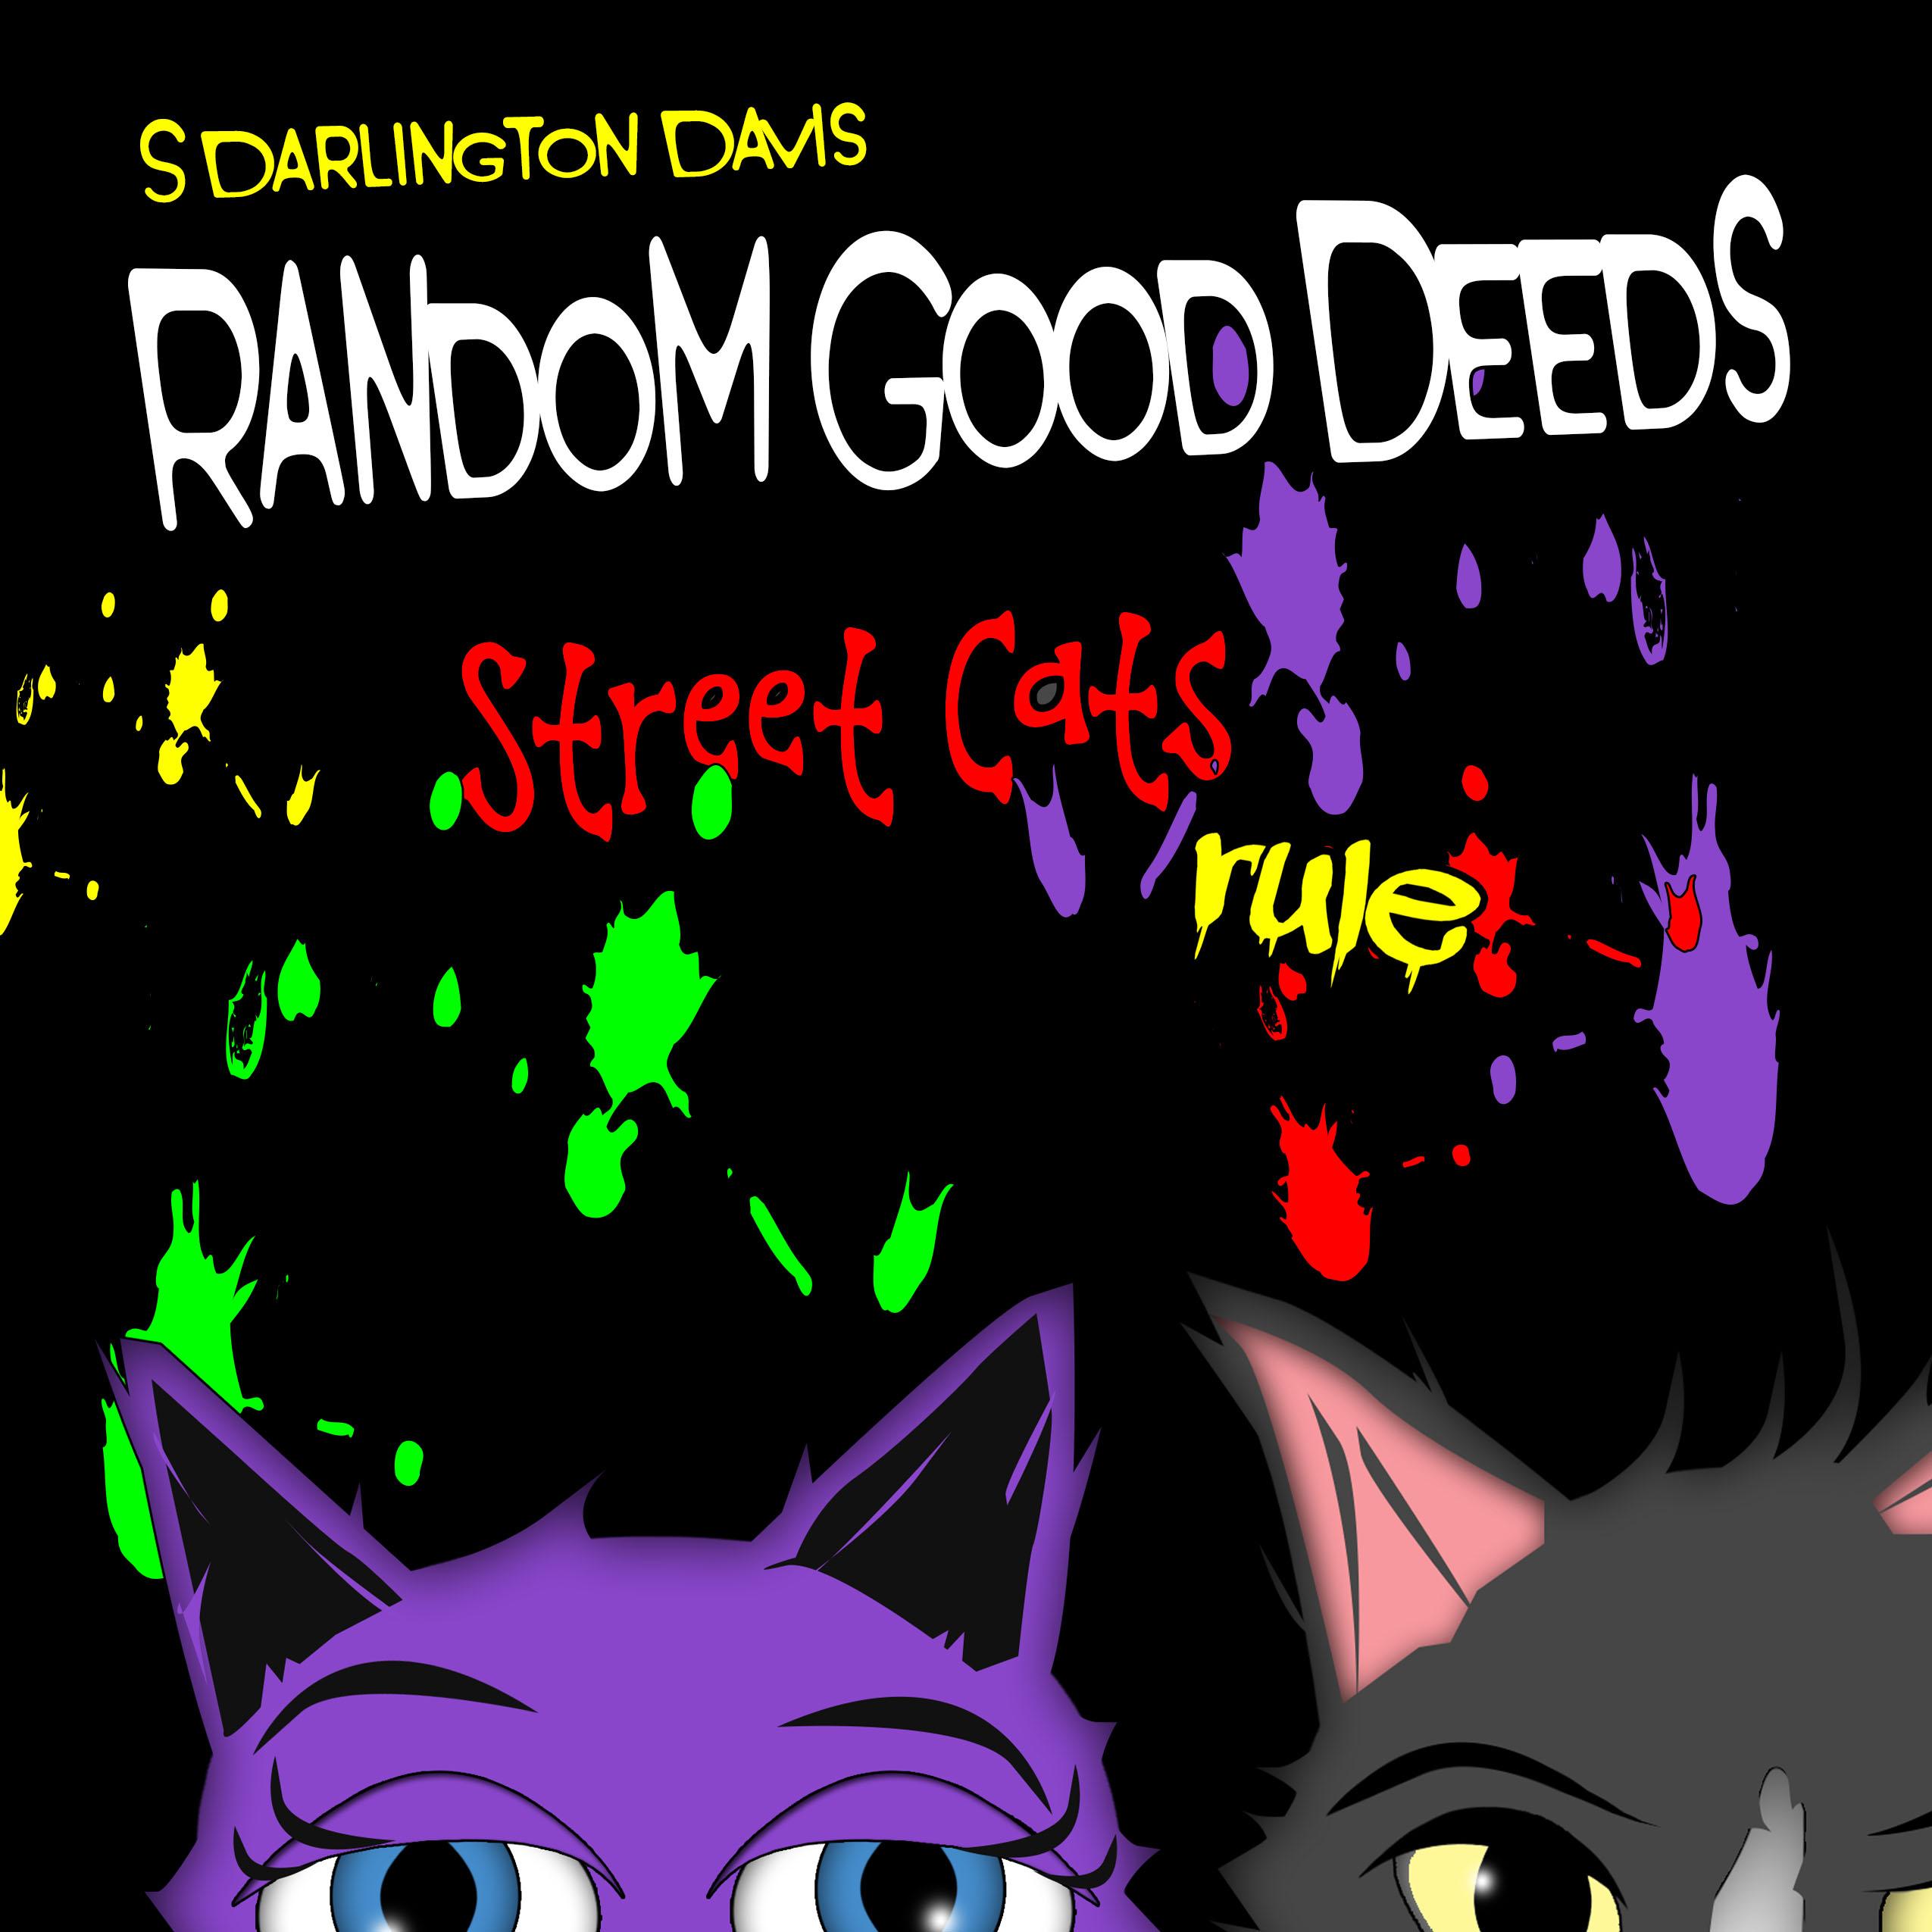 Random Good Deeds